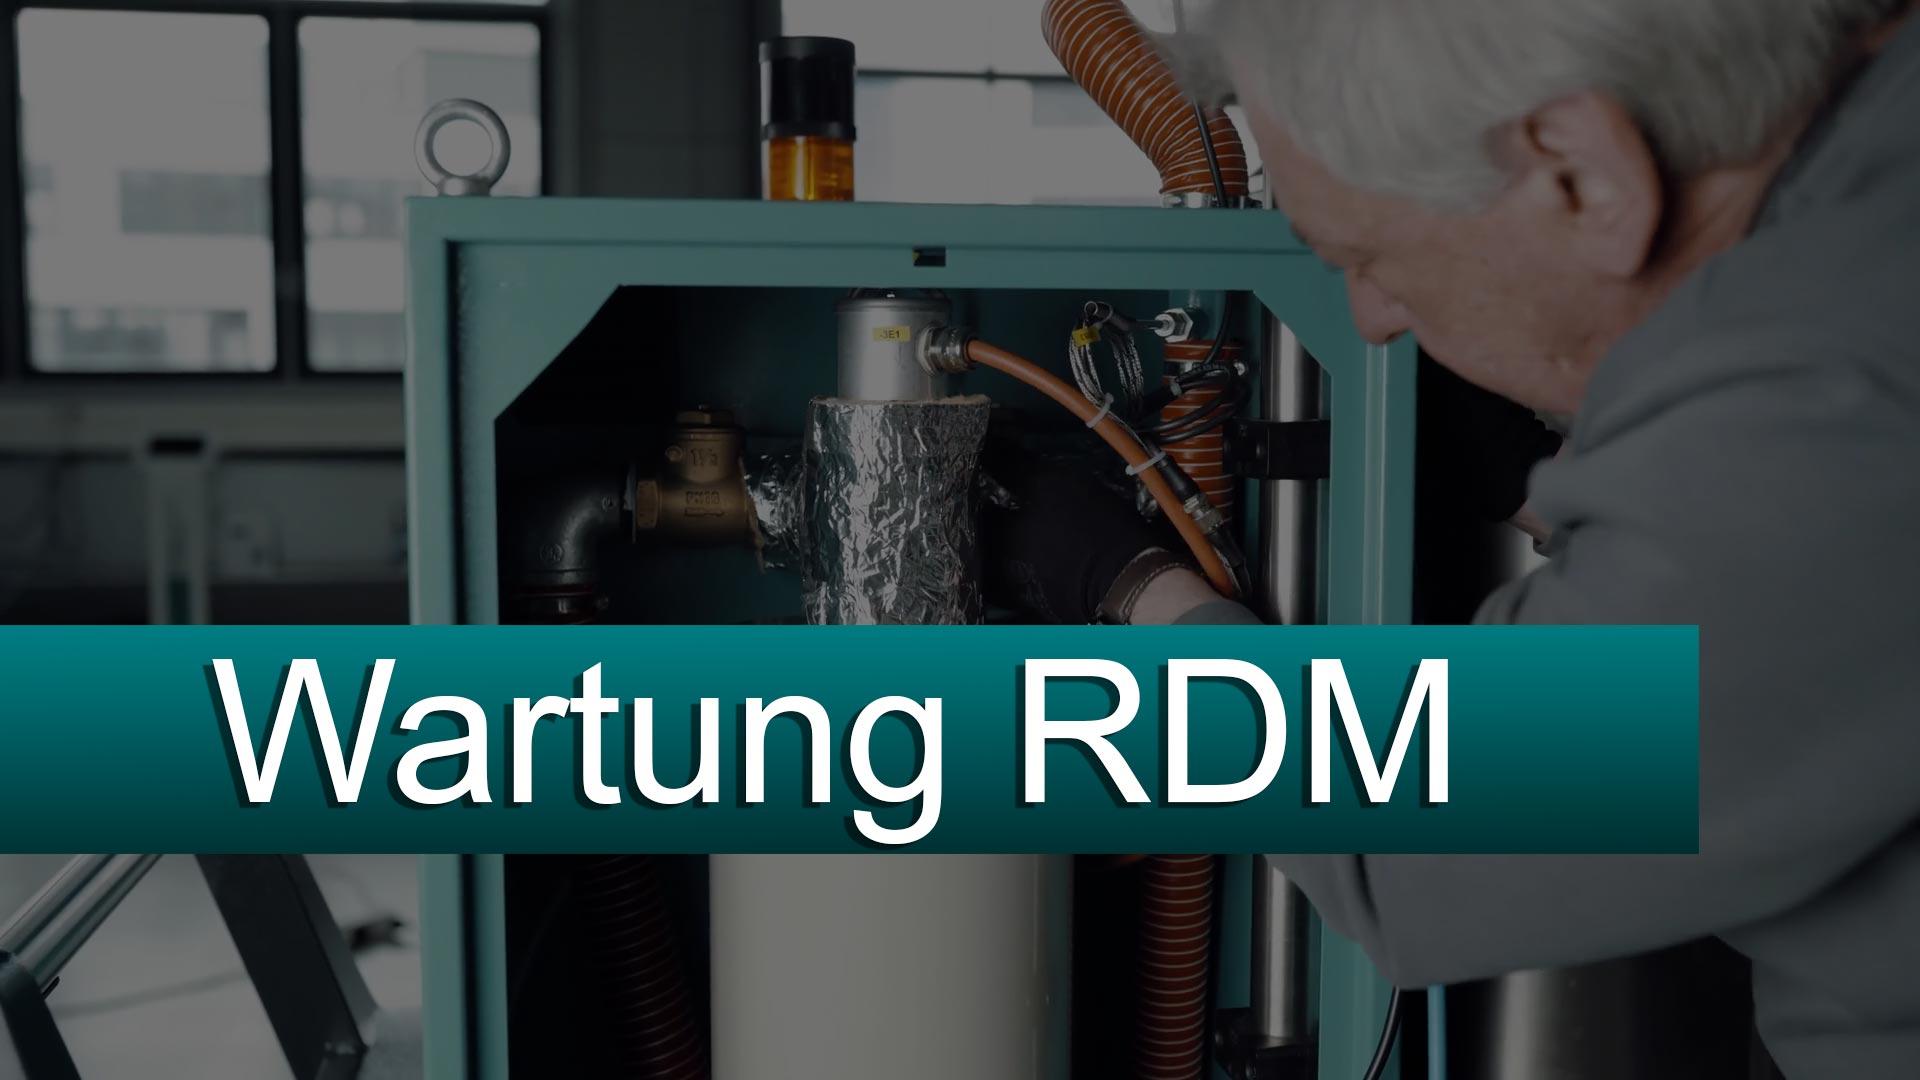 RDM_WARTUNG_upload